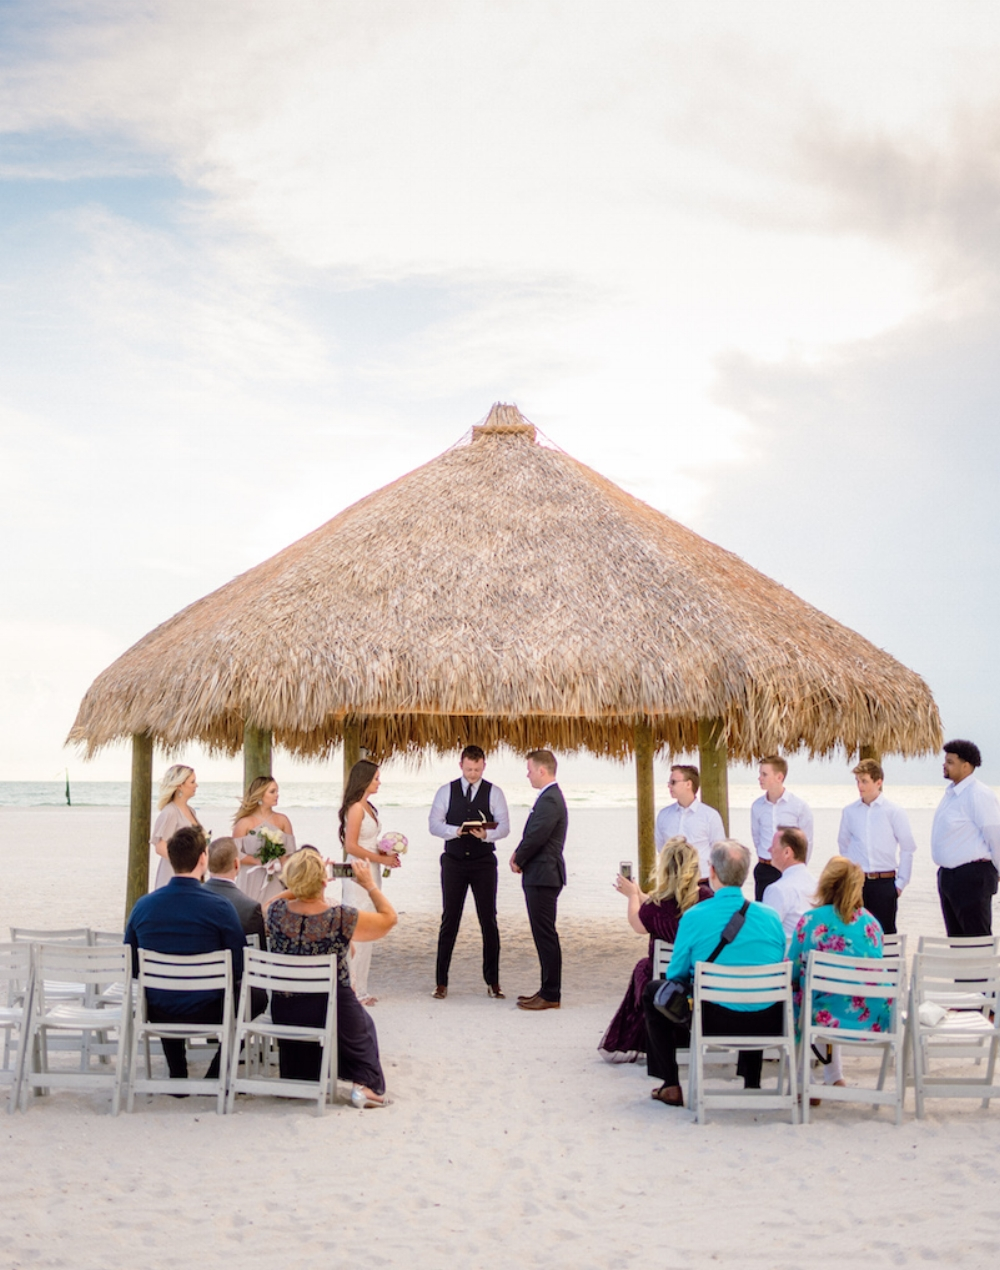 JW Marriott Marco Island Weddings by Matt Steeves Photography 10.jpg